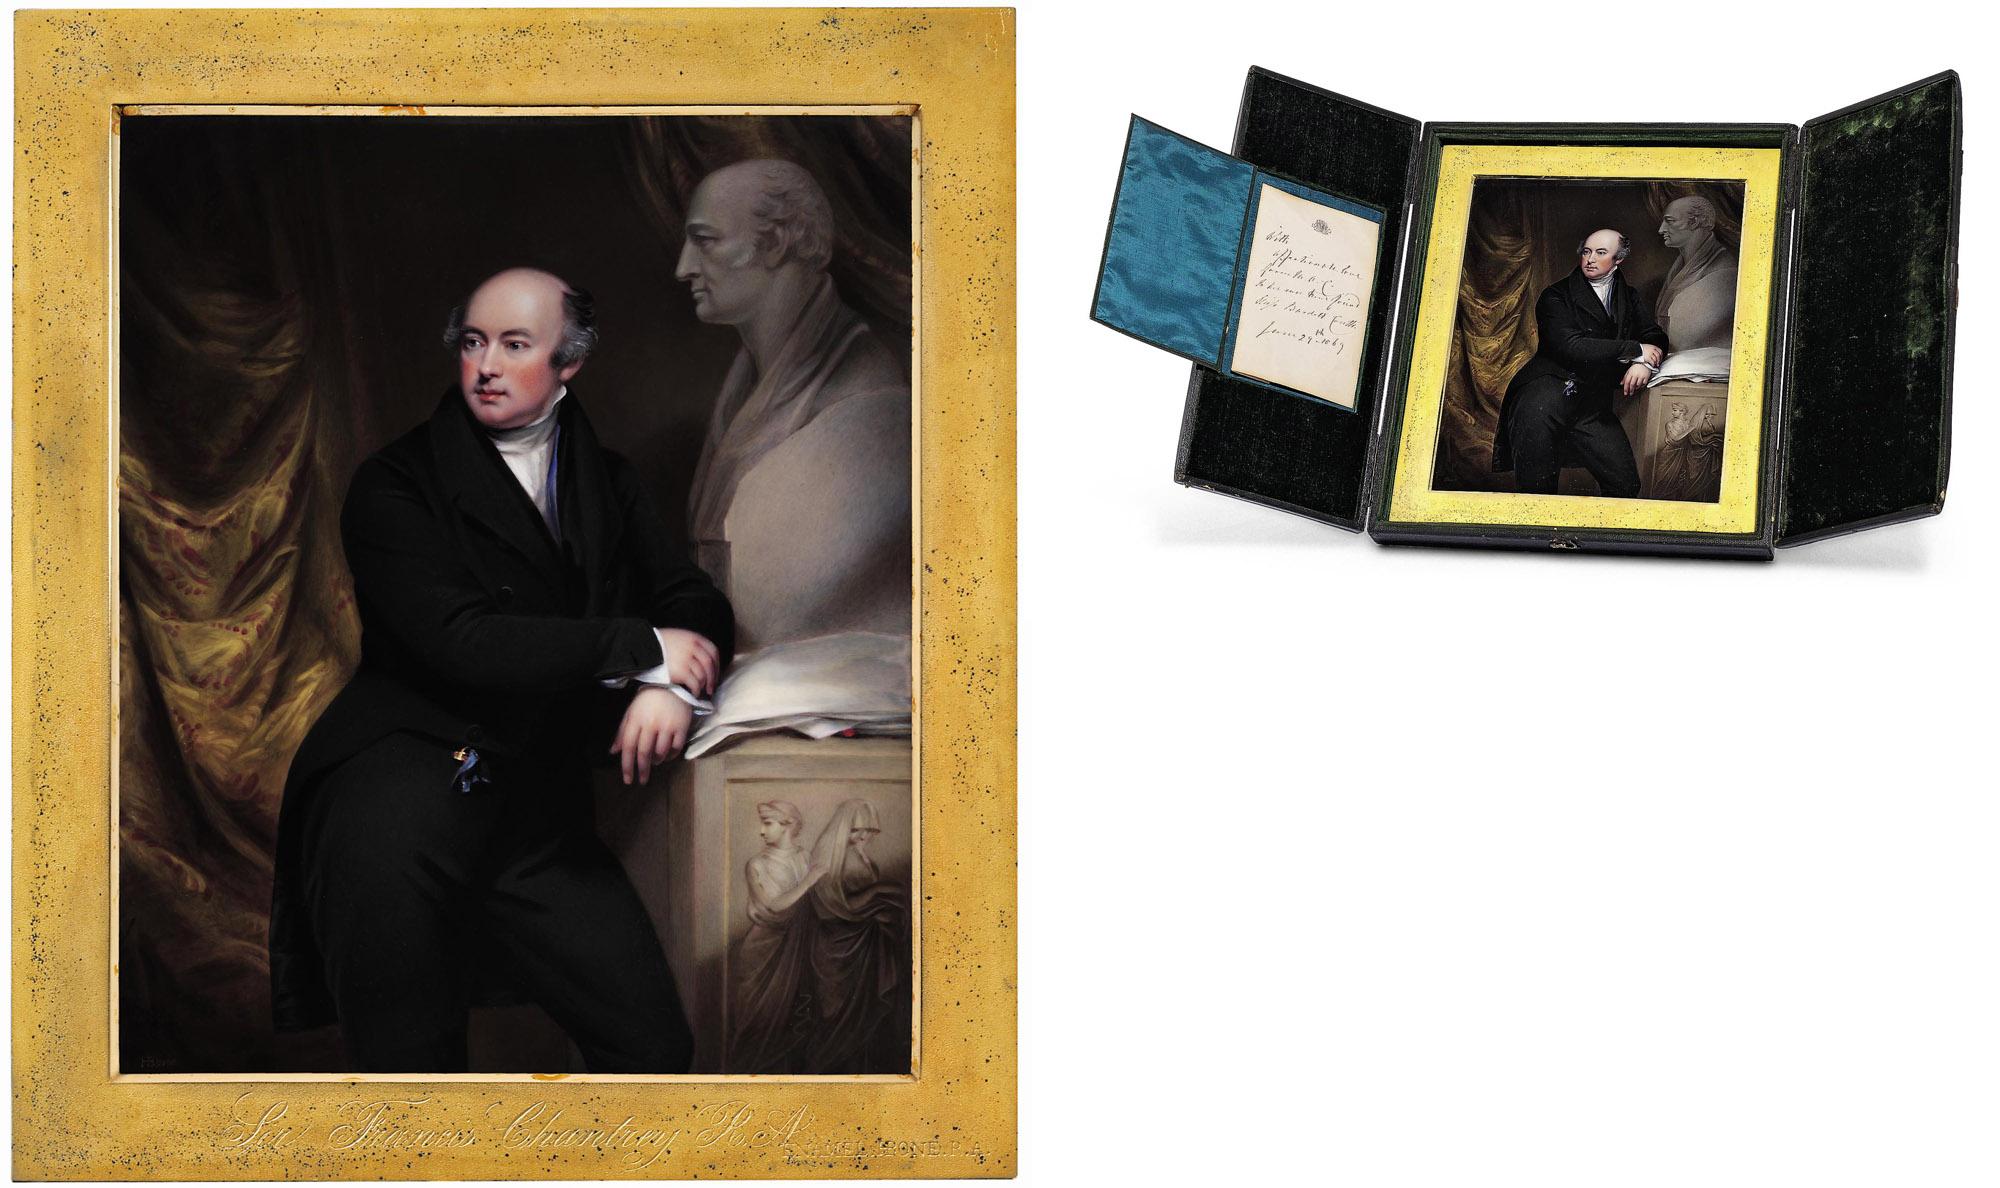 HENRY BONE, R.A. (BRITISH, 1755-1834) AFTER JOHN JACKSON, R.A.